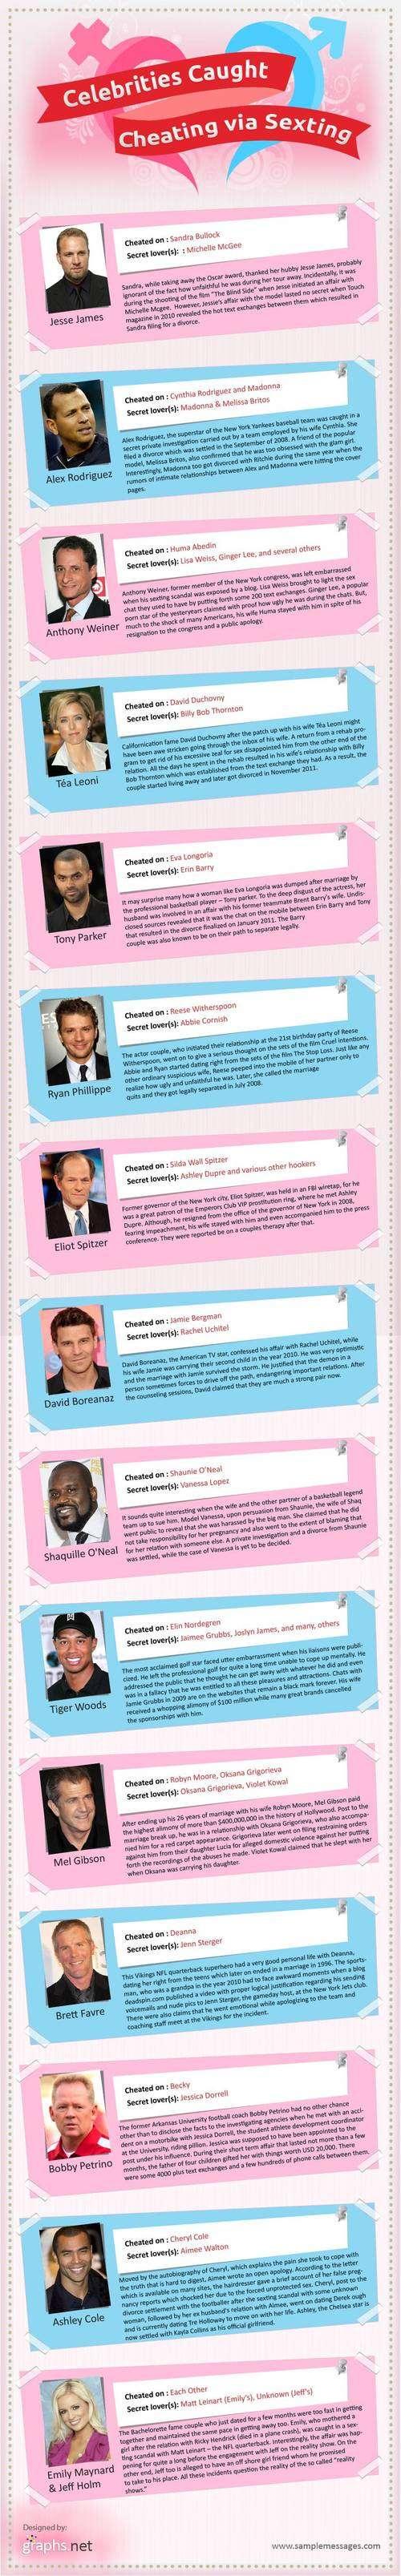 Celebrities-Caught-Cheating-via-Texting